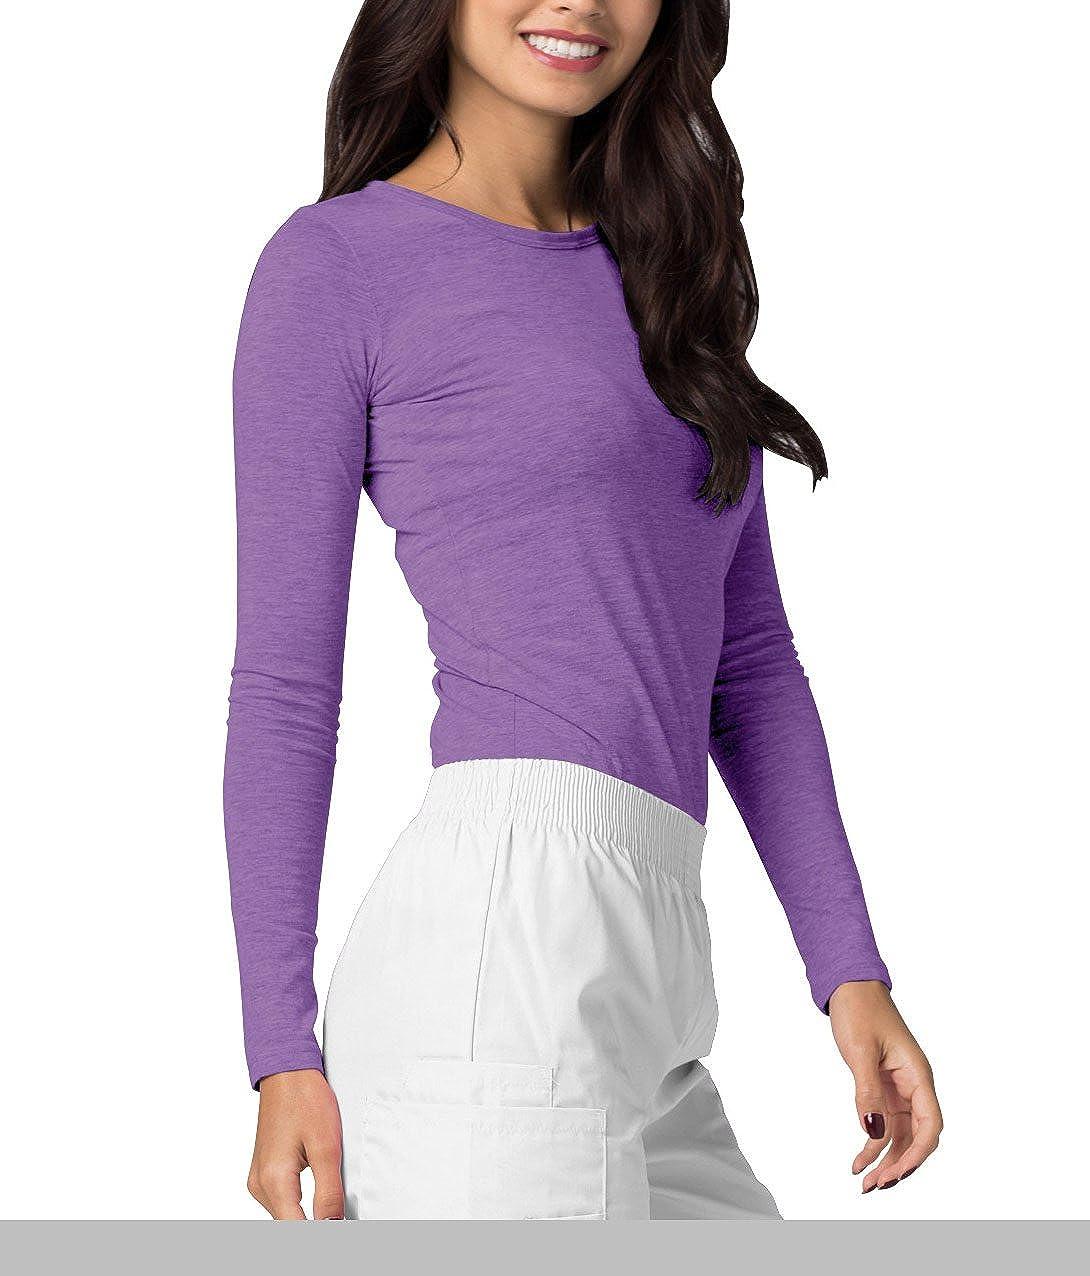 Adar Underscrubs for Women - Long Sleeve Underscrub Comfort Tee Heather Purple